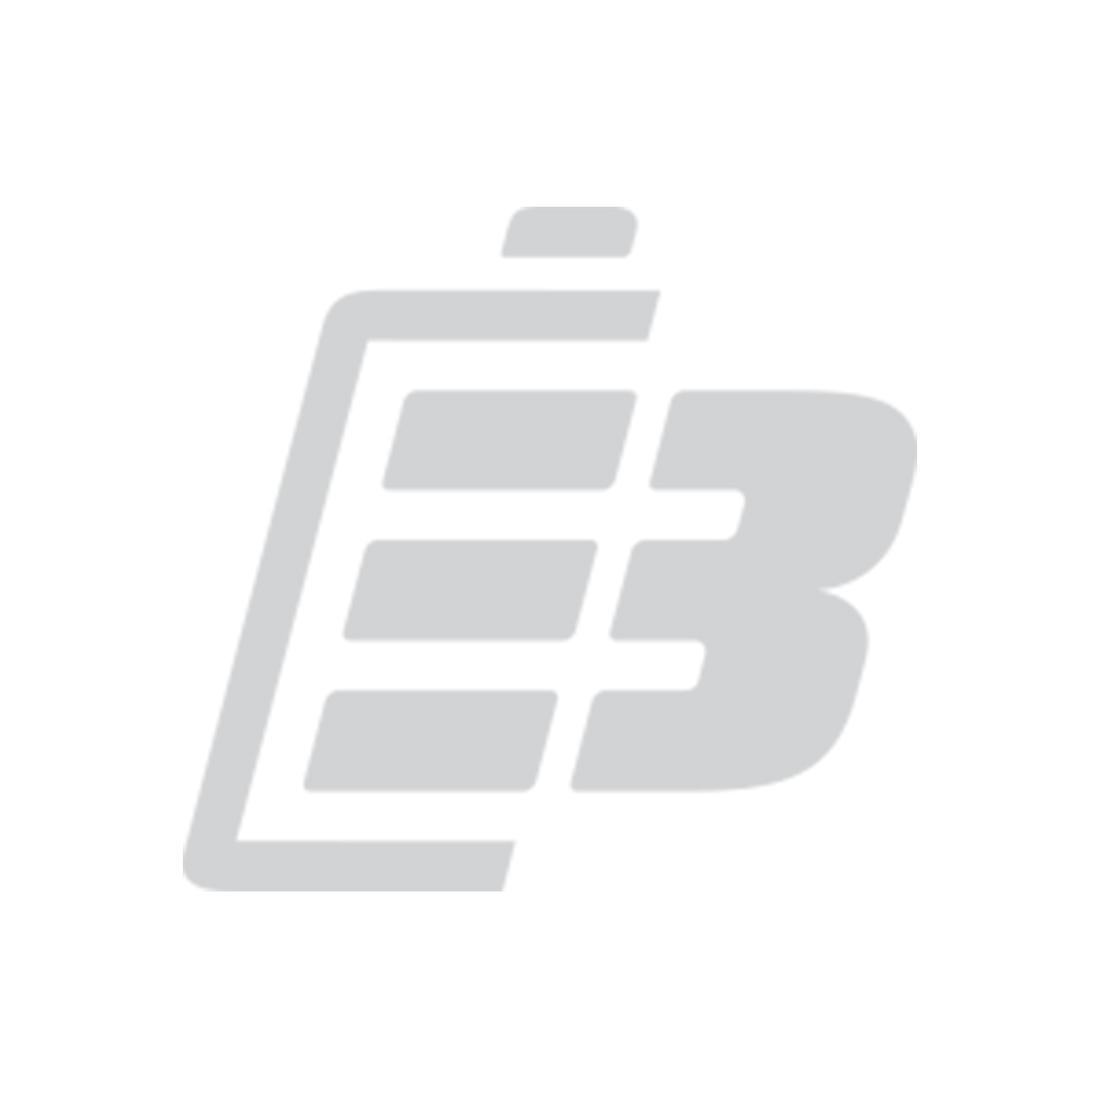 Smartphone battery Zopo ZP980_1